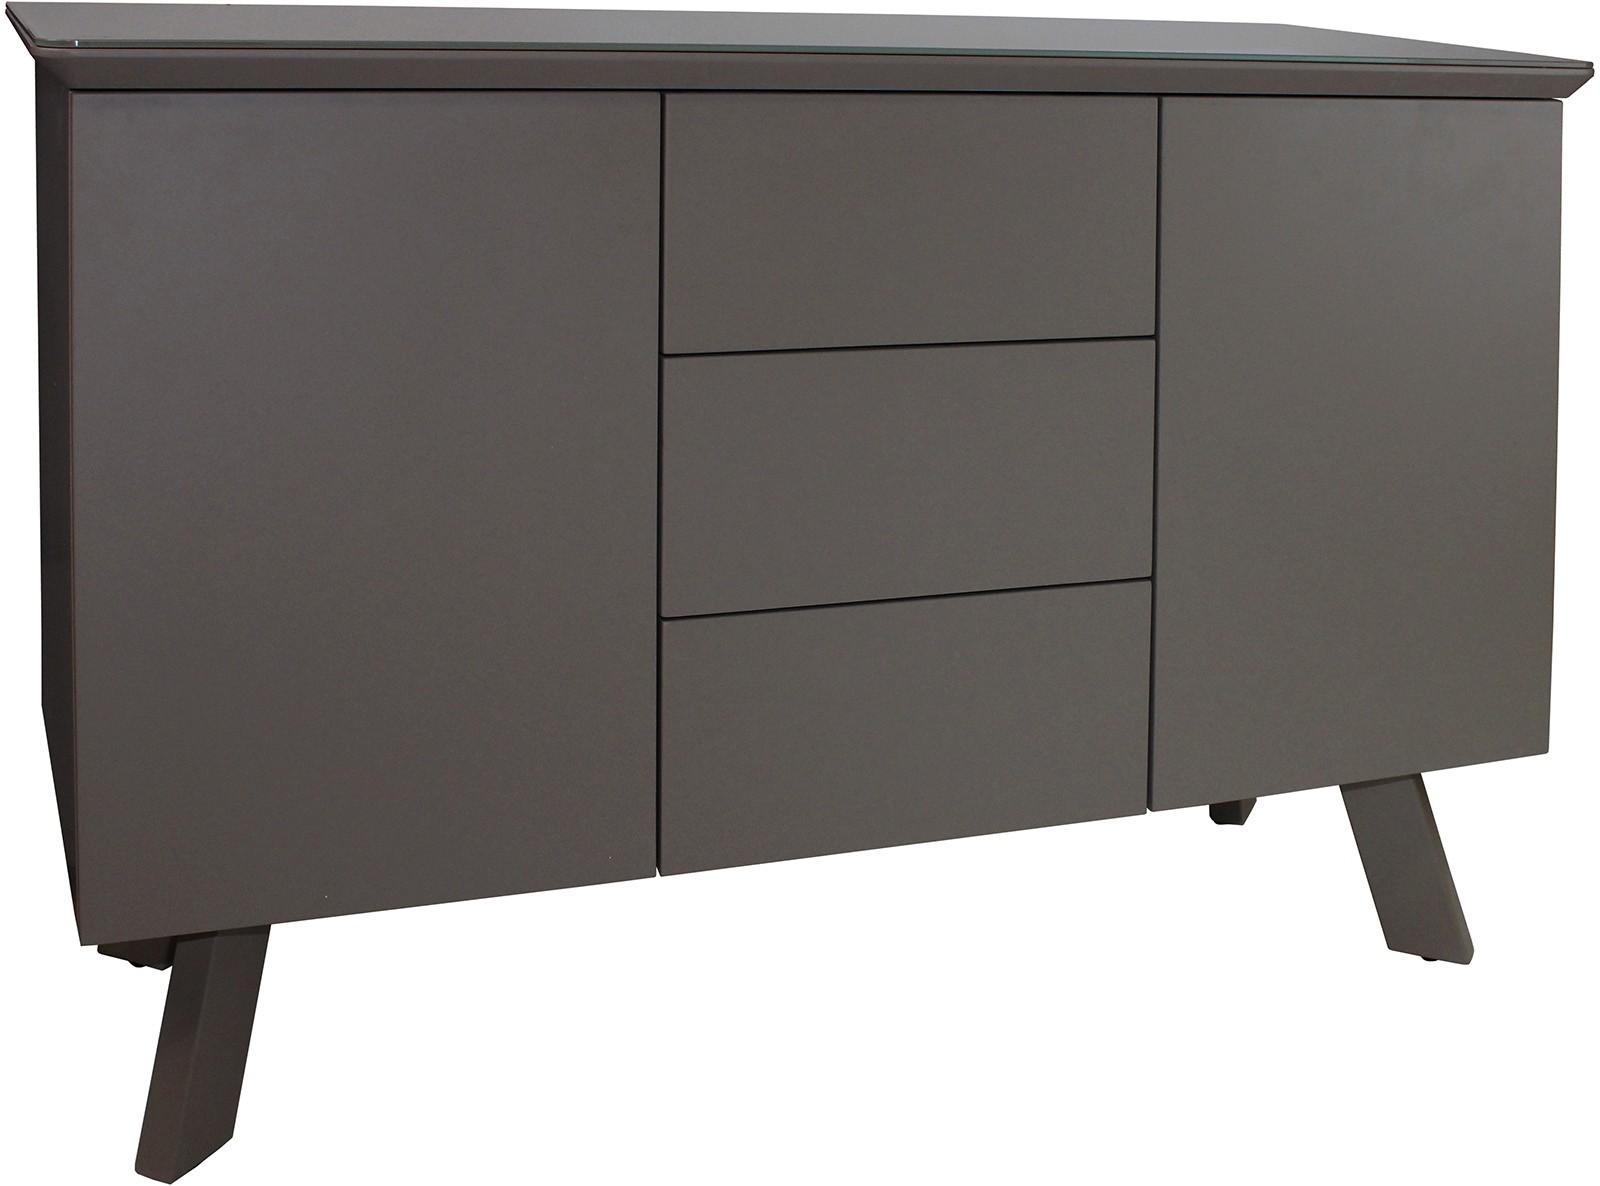 CONTEMPORARY Small Sideboard - Grey